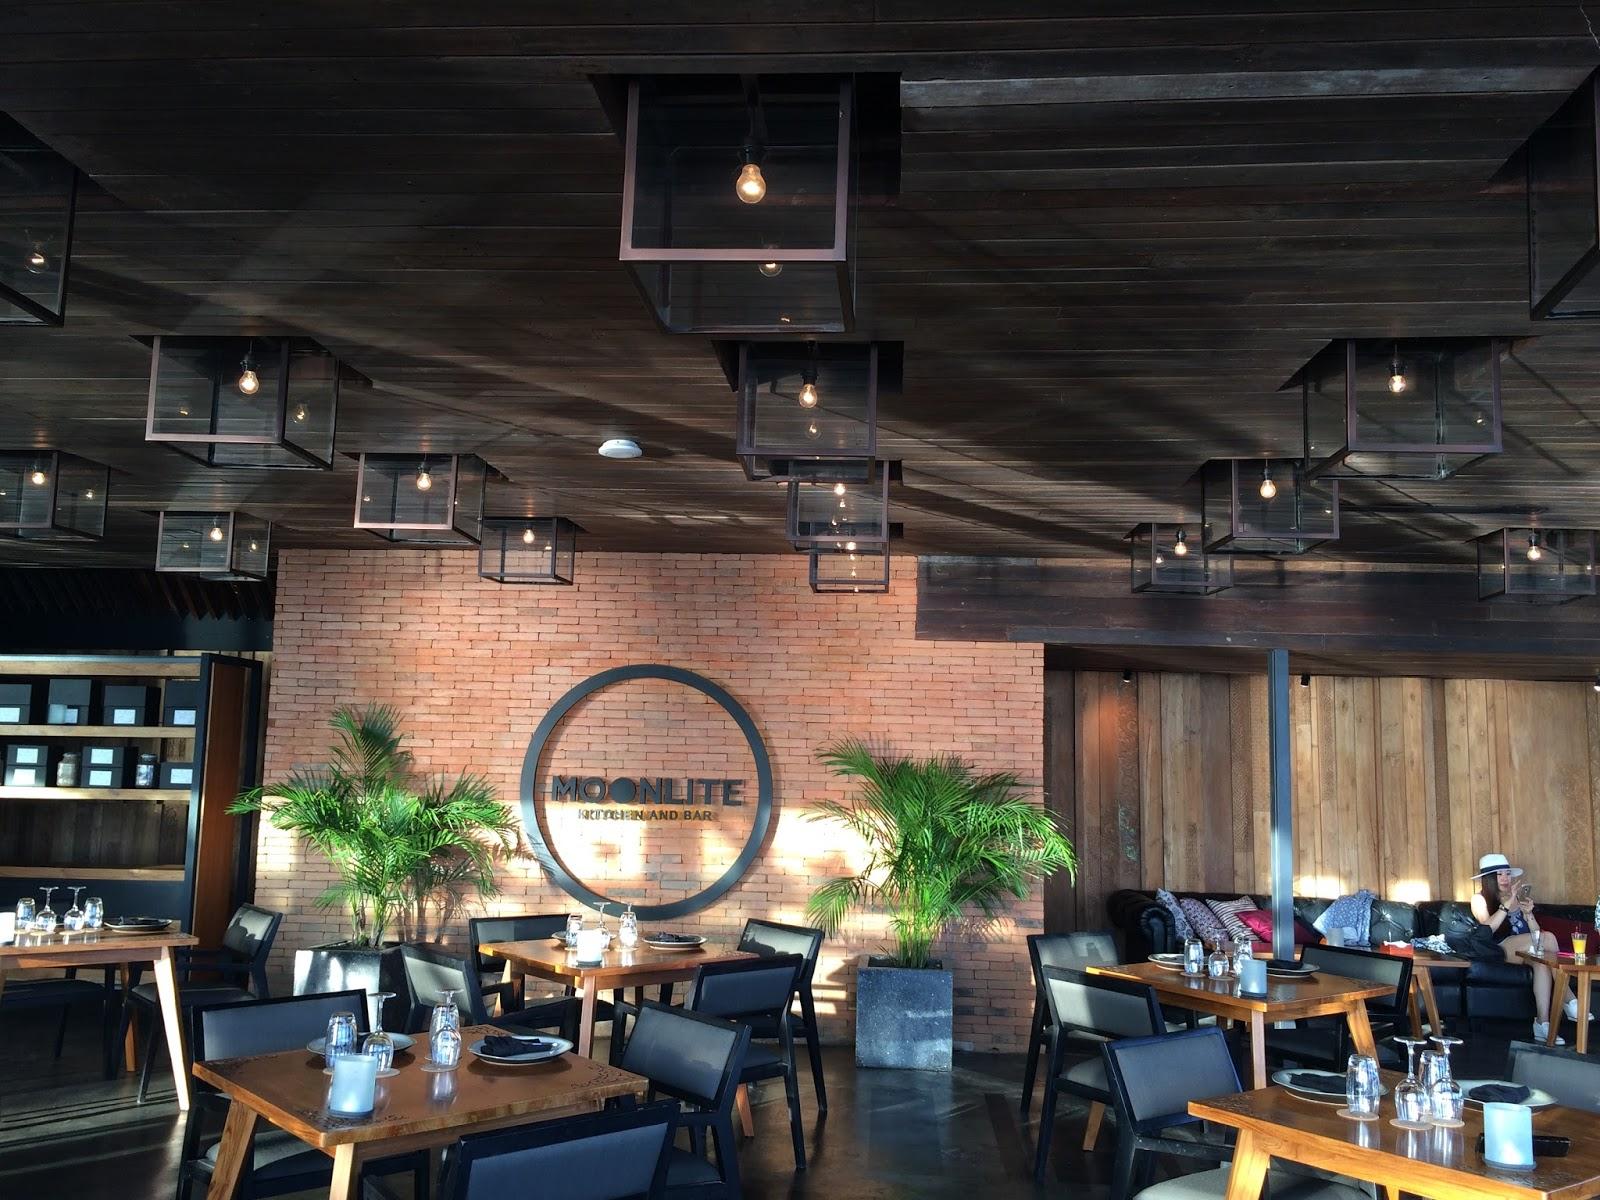 Moonlite Kitchen and Bar   Seminyak, Bali   Travel is my ...